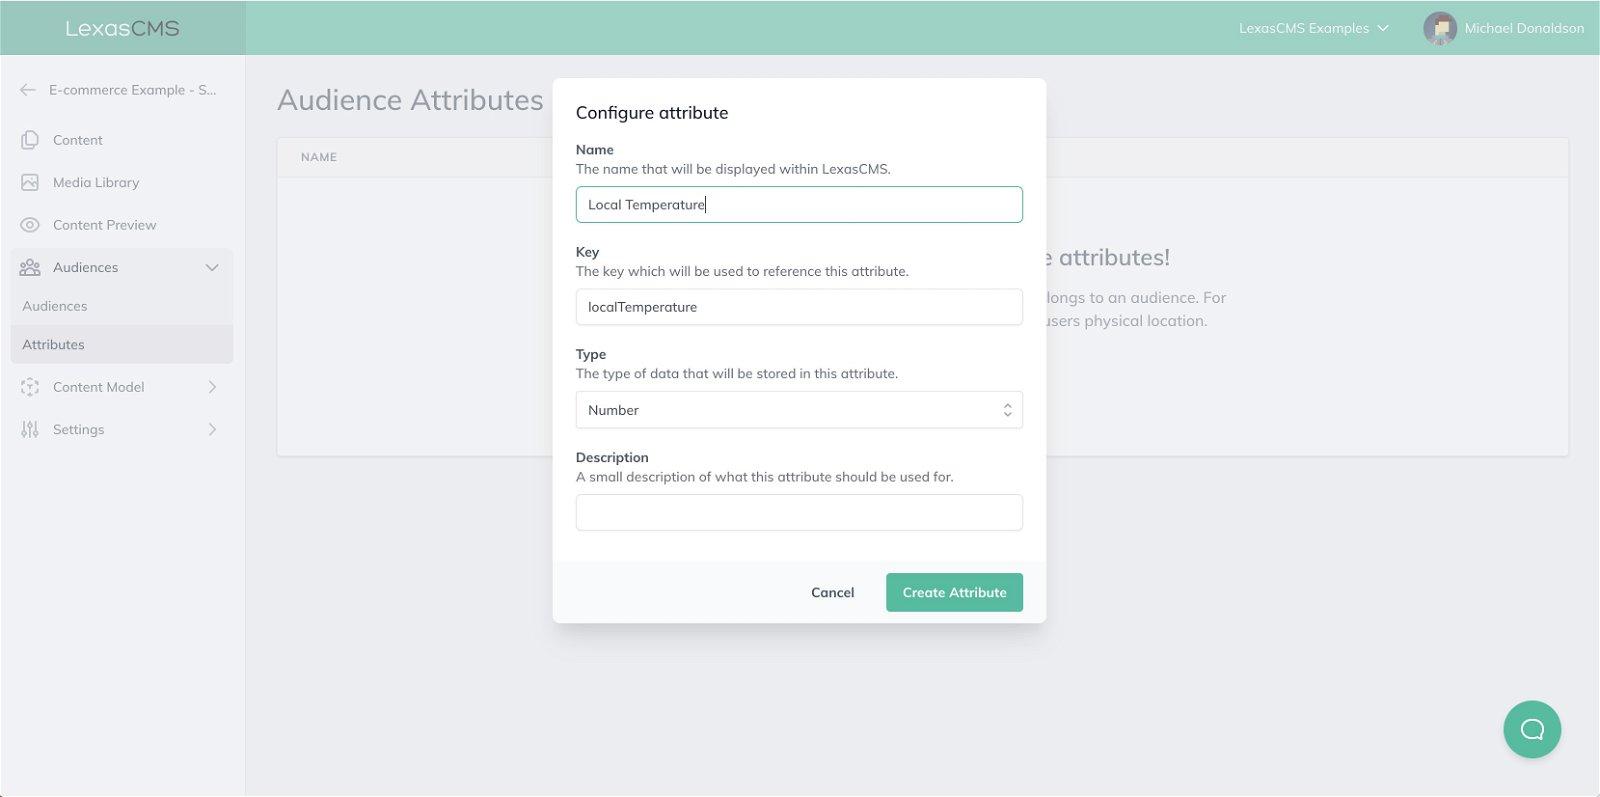 Create Audience Attribute